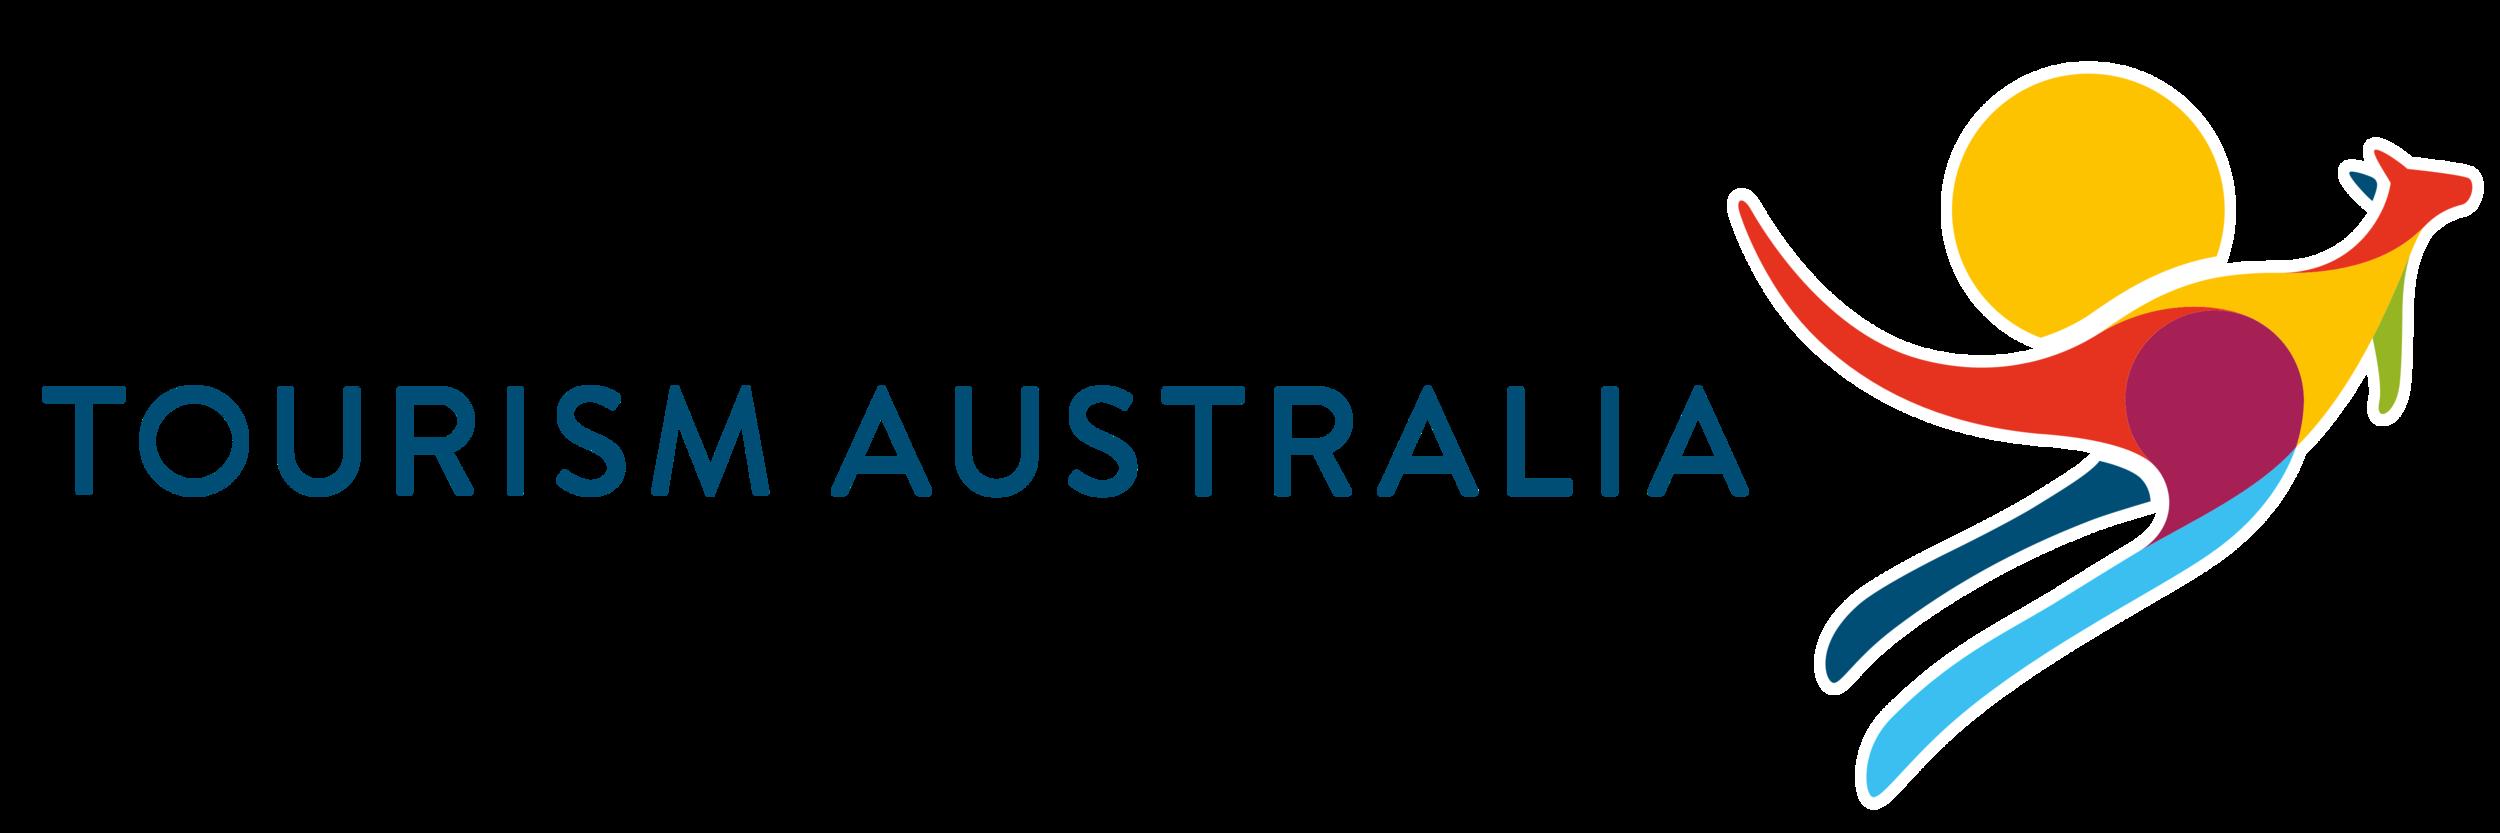 Tourism-Australia-Logo-big.jpg